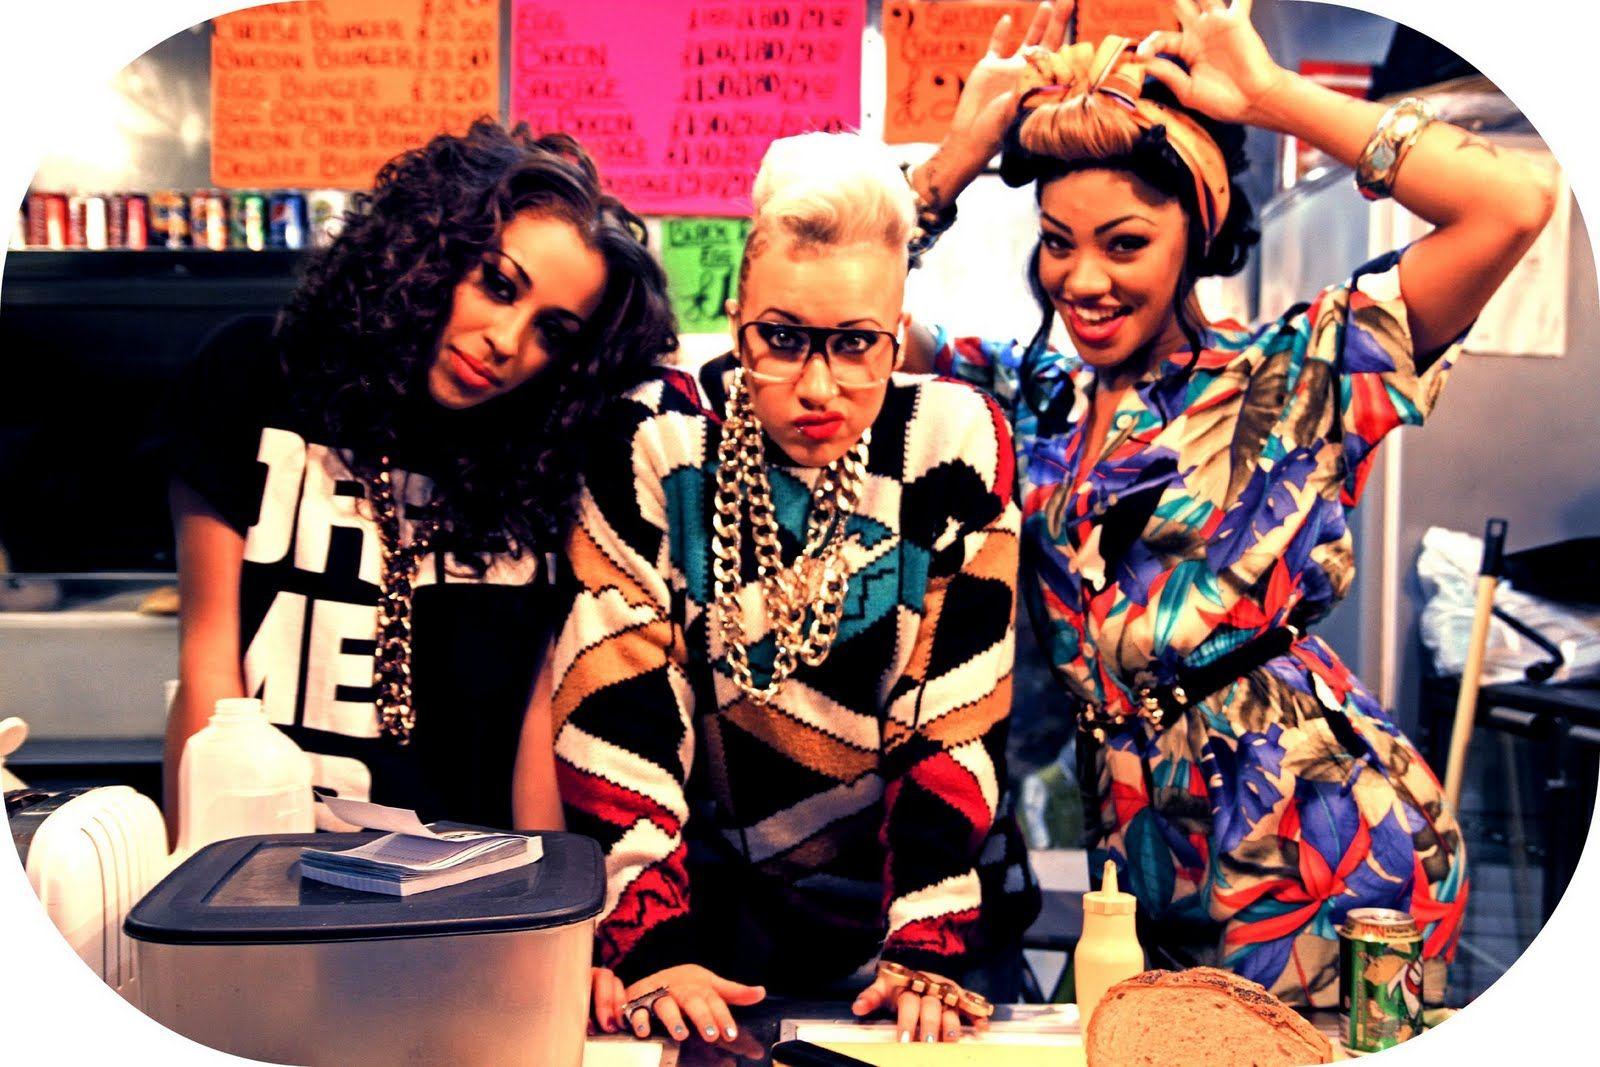 90u0026#39;s hip hop outfit | All abt tha 90s | Pinterest | Fashion Hip hop fashion and 90s fashion